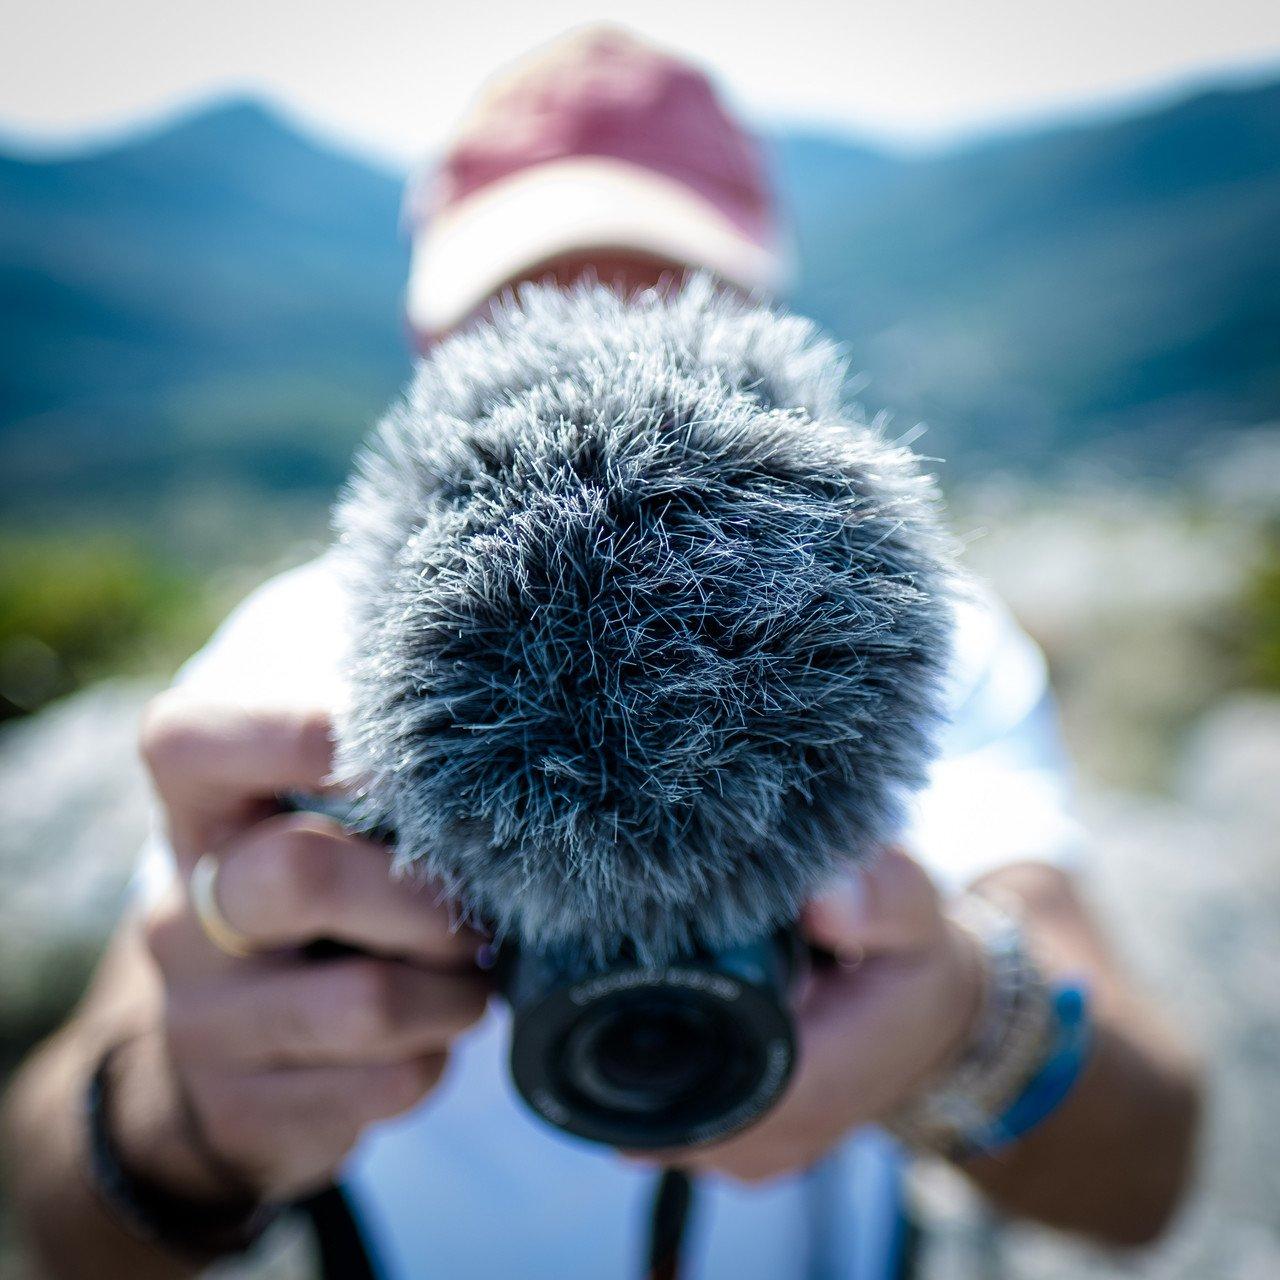 Camera and sound equipment